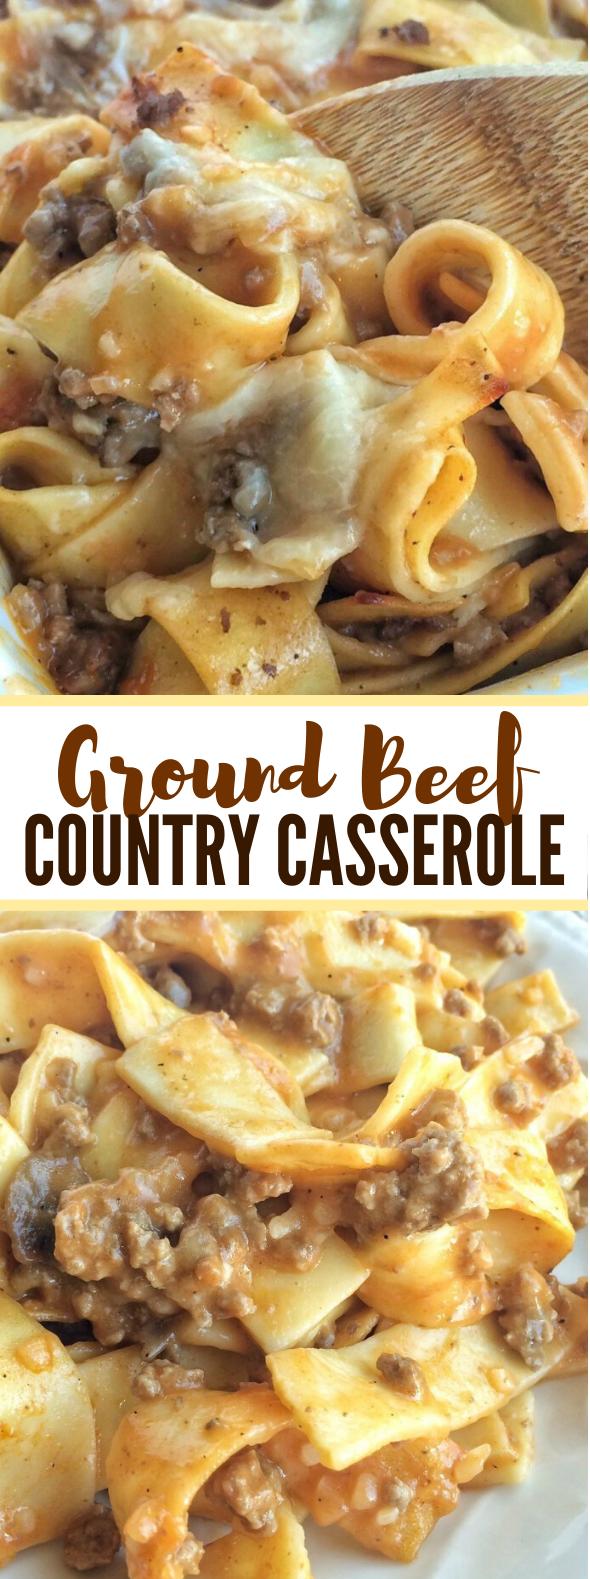 GROUND BEEF COUNTRY CASSEROLE #dinner #comfortfood